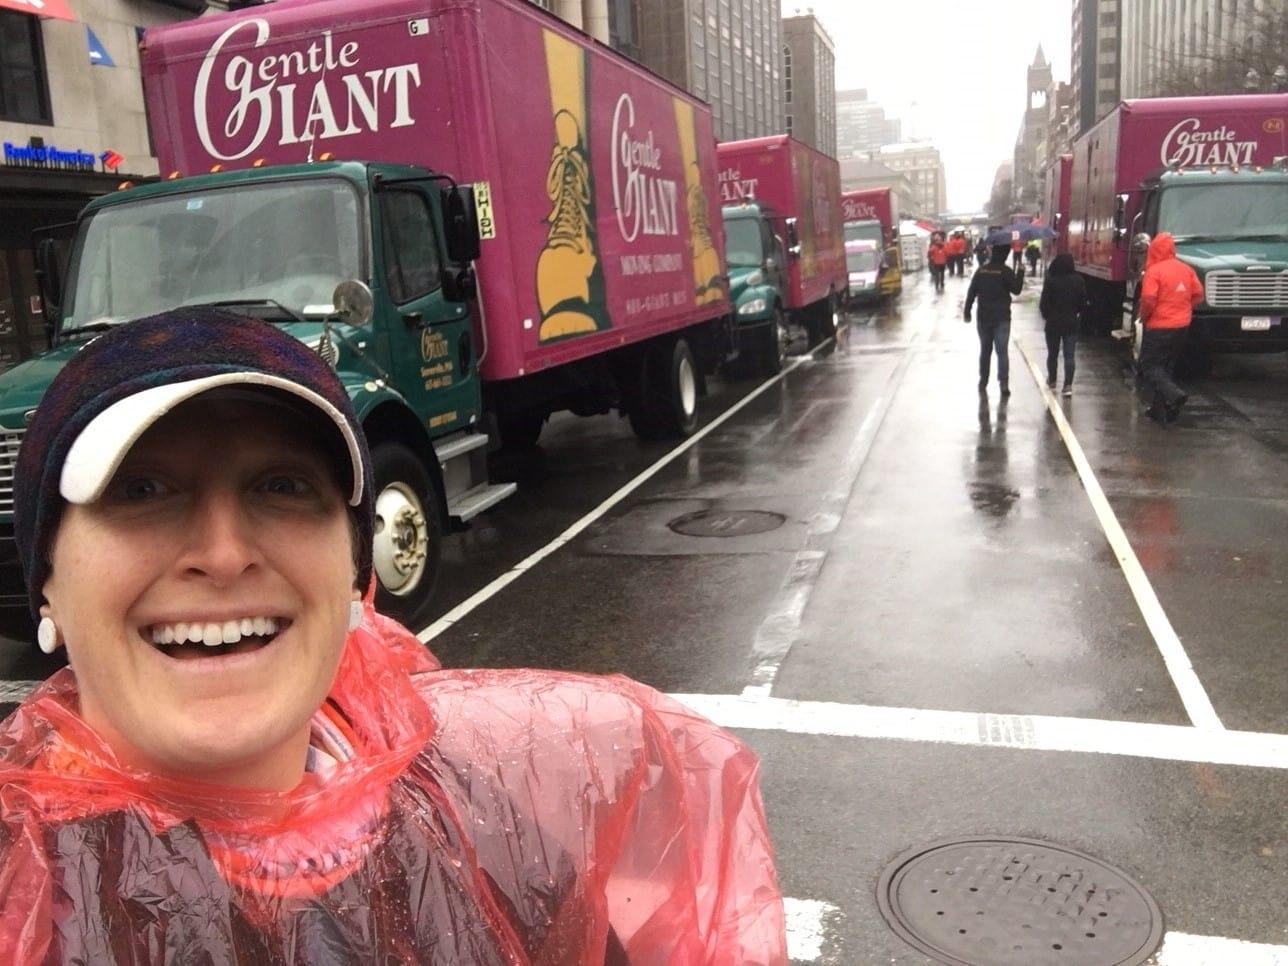 From Hopkinton to the Finish Line: A Gentle Giant Boston Marathon Journey